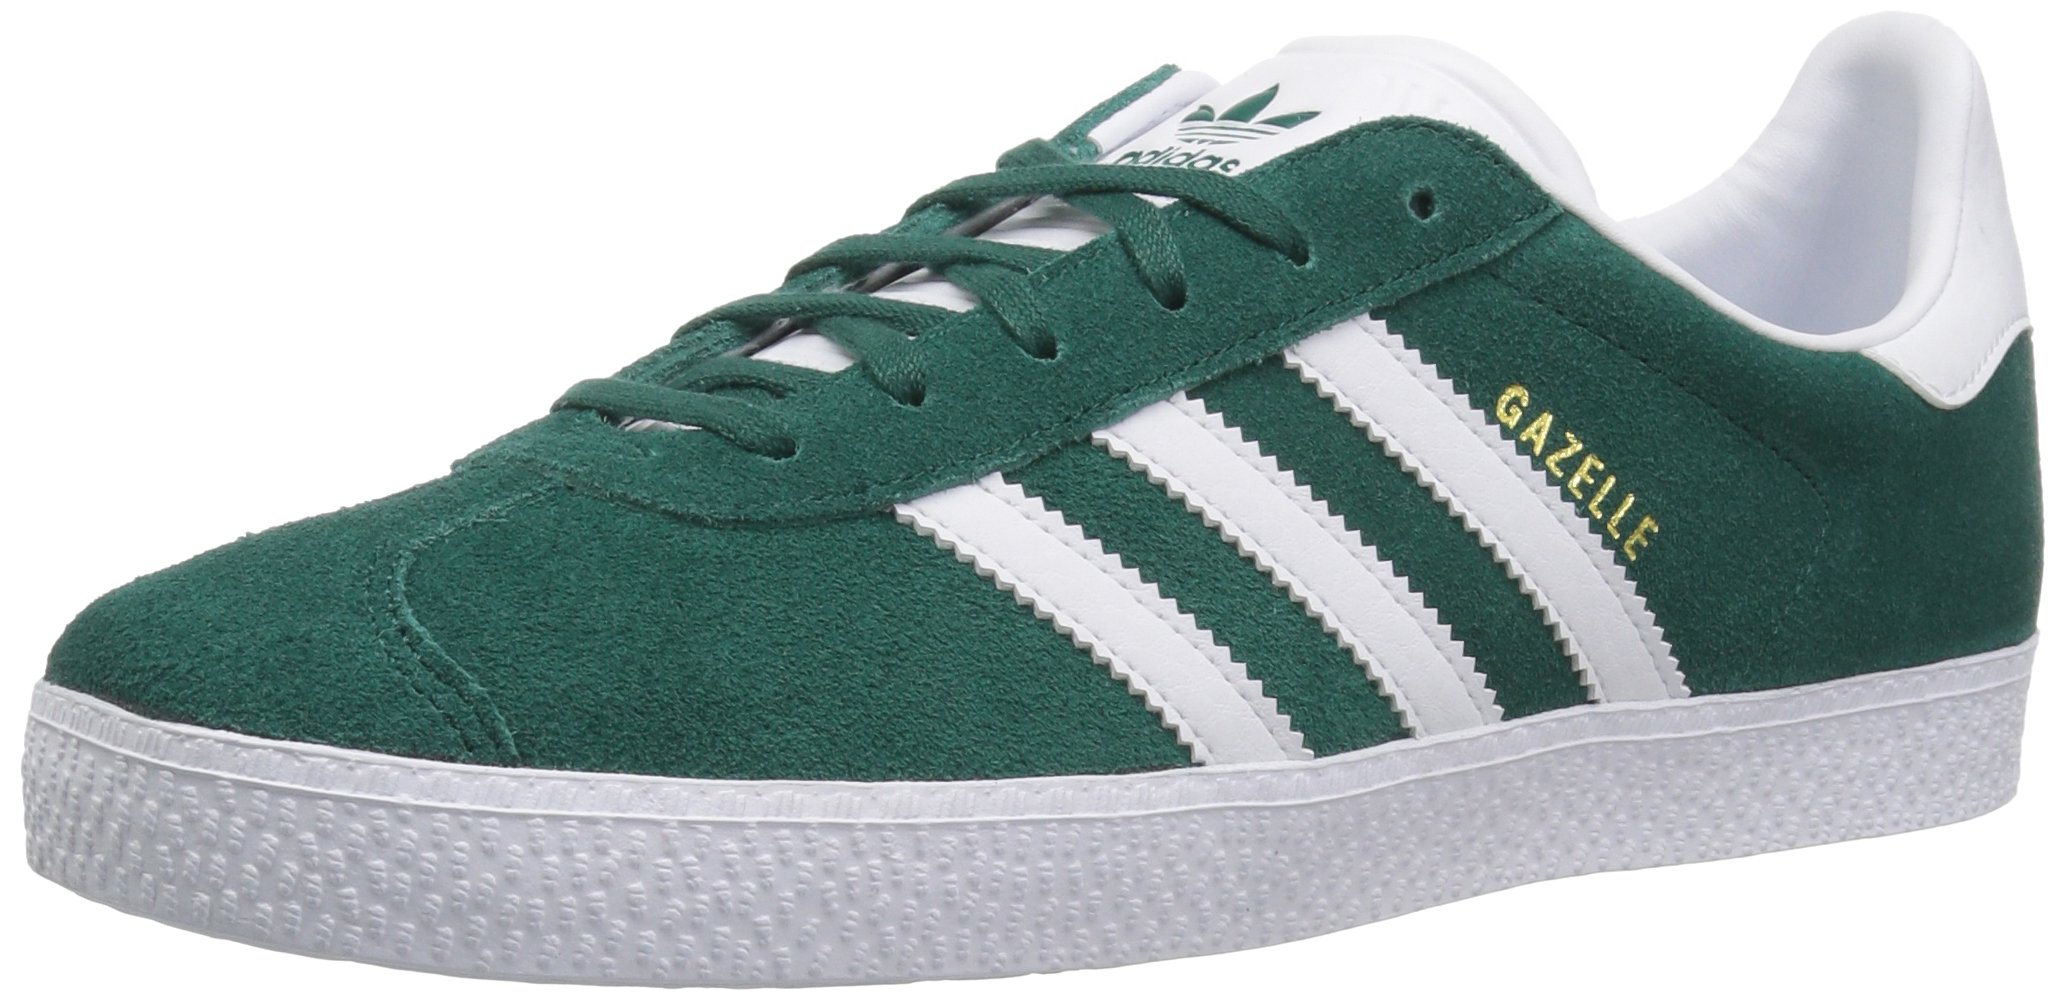 factory authentic c38b8 3a205 Galleon - Adidas Originals Unisex Gazelle Sneaker, WhiteNoble Green, 1.5 M  US Little Kid